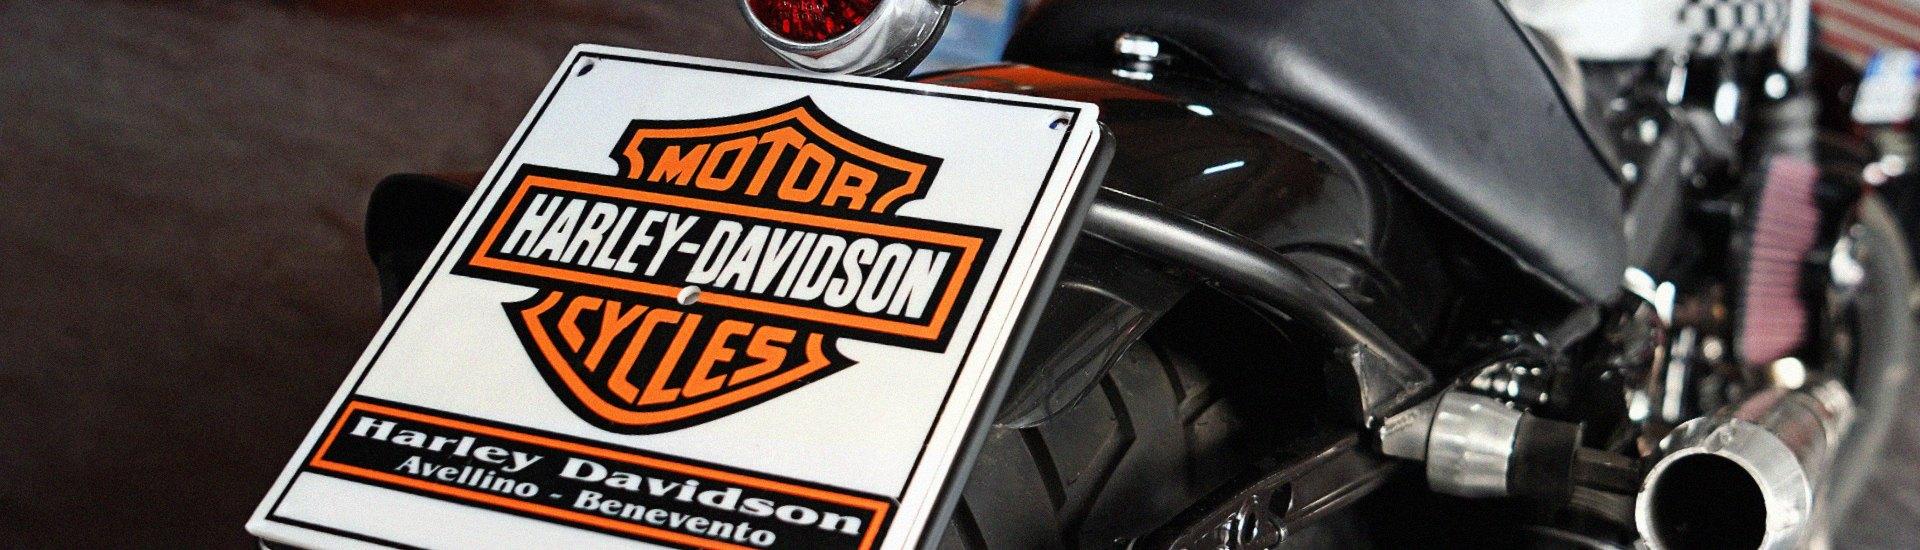 www.motorcycleid.com